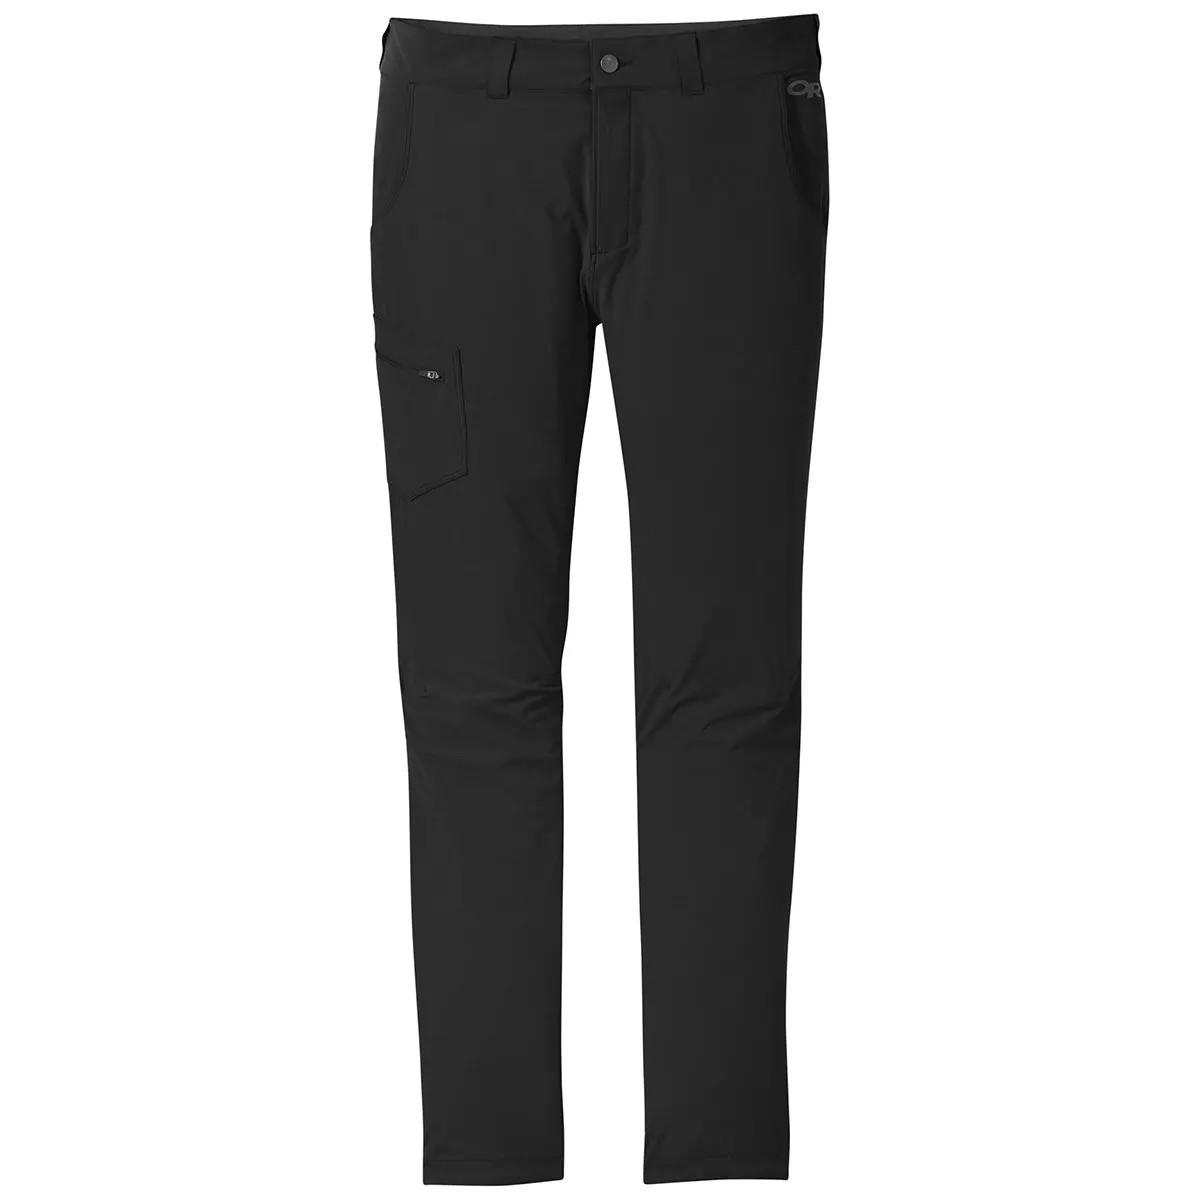 "Outdoor Research Men's Ferrosi Pants - 34"" Inseam - black"